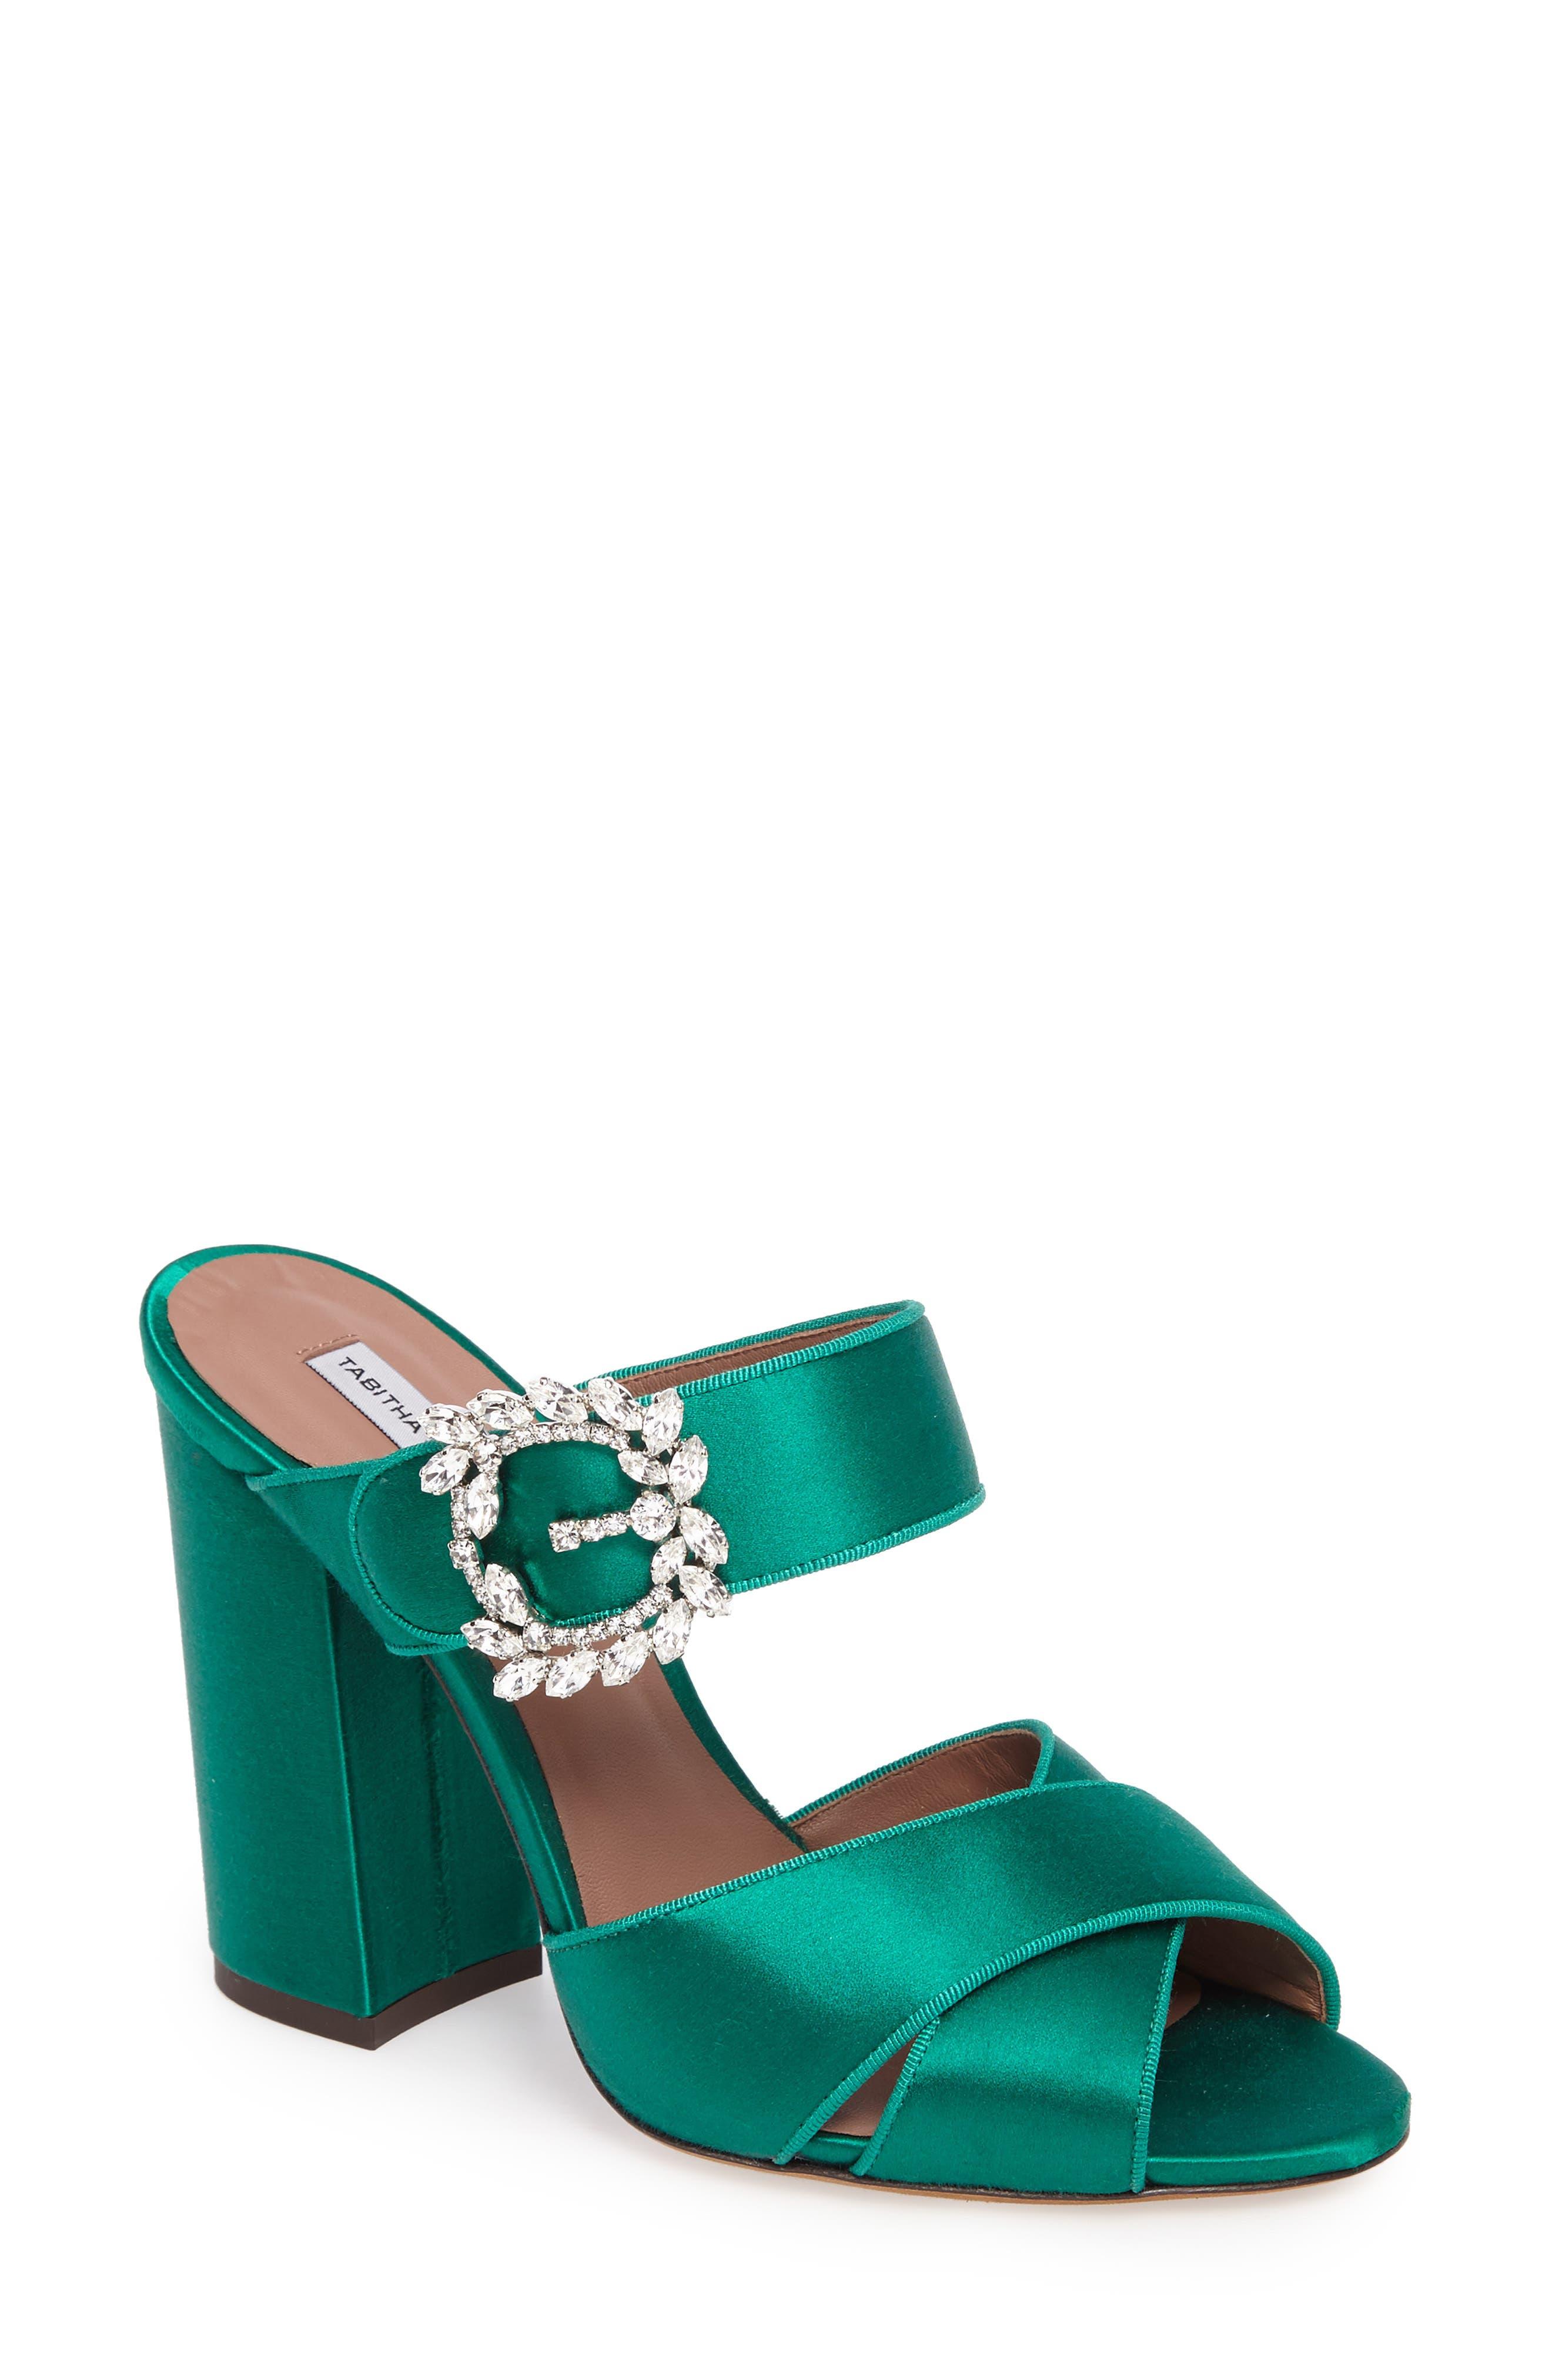 Reyner Crystal Buckle Sandal,                         Main,                         color, Emerald Green